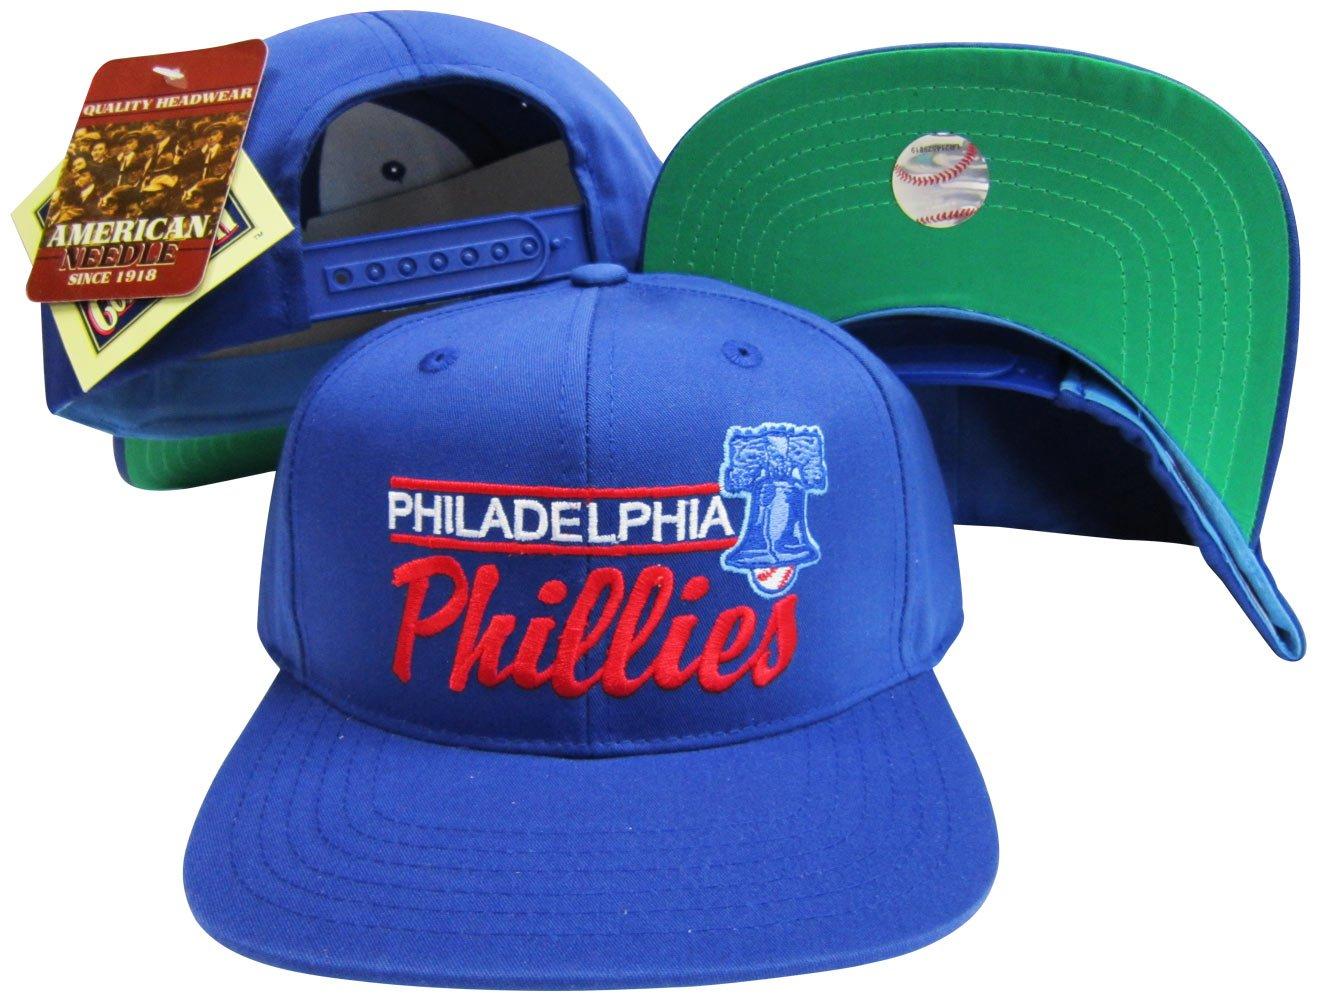 Vancouver Canucks Vintage Snapback Hat American Needle Licensed Brand New Cap